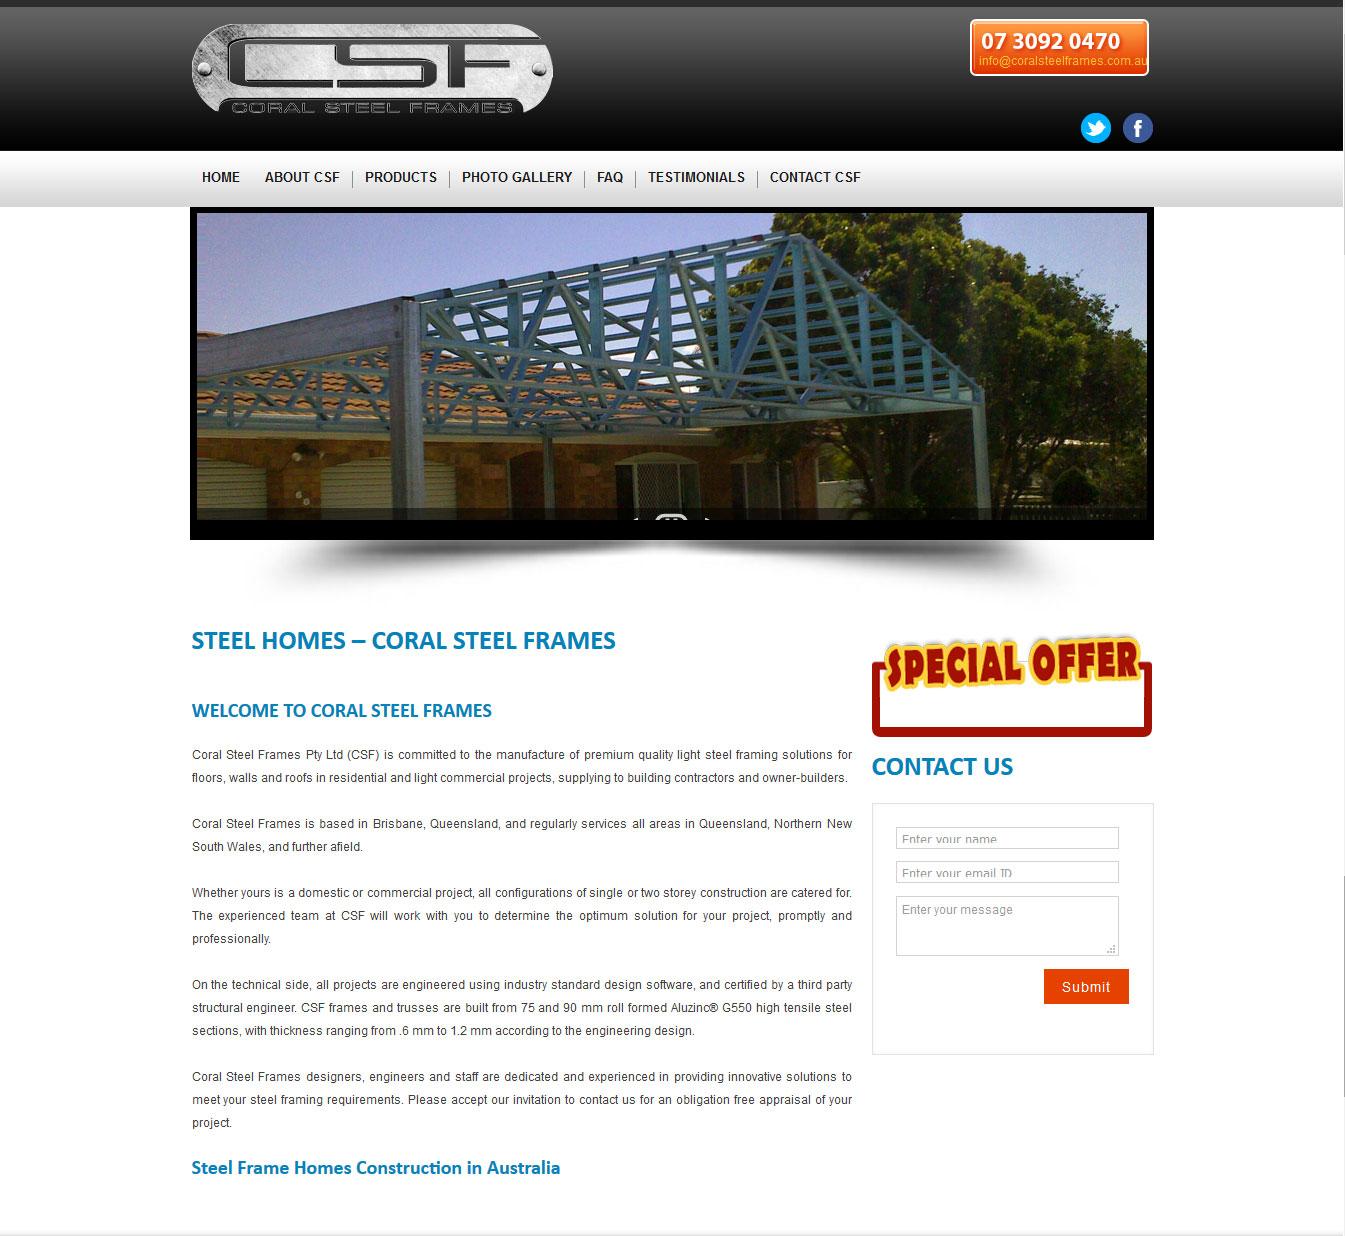 Coral Steel Frames